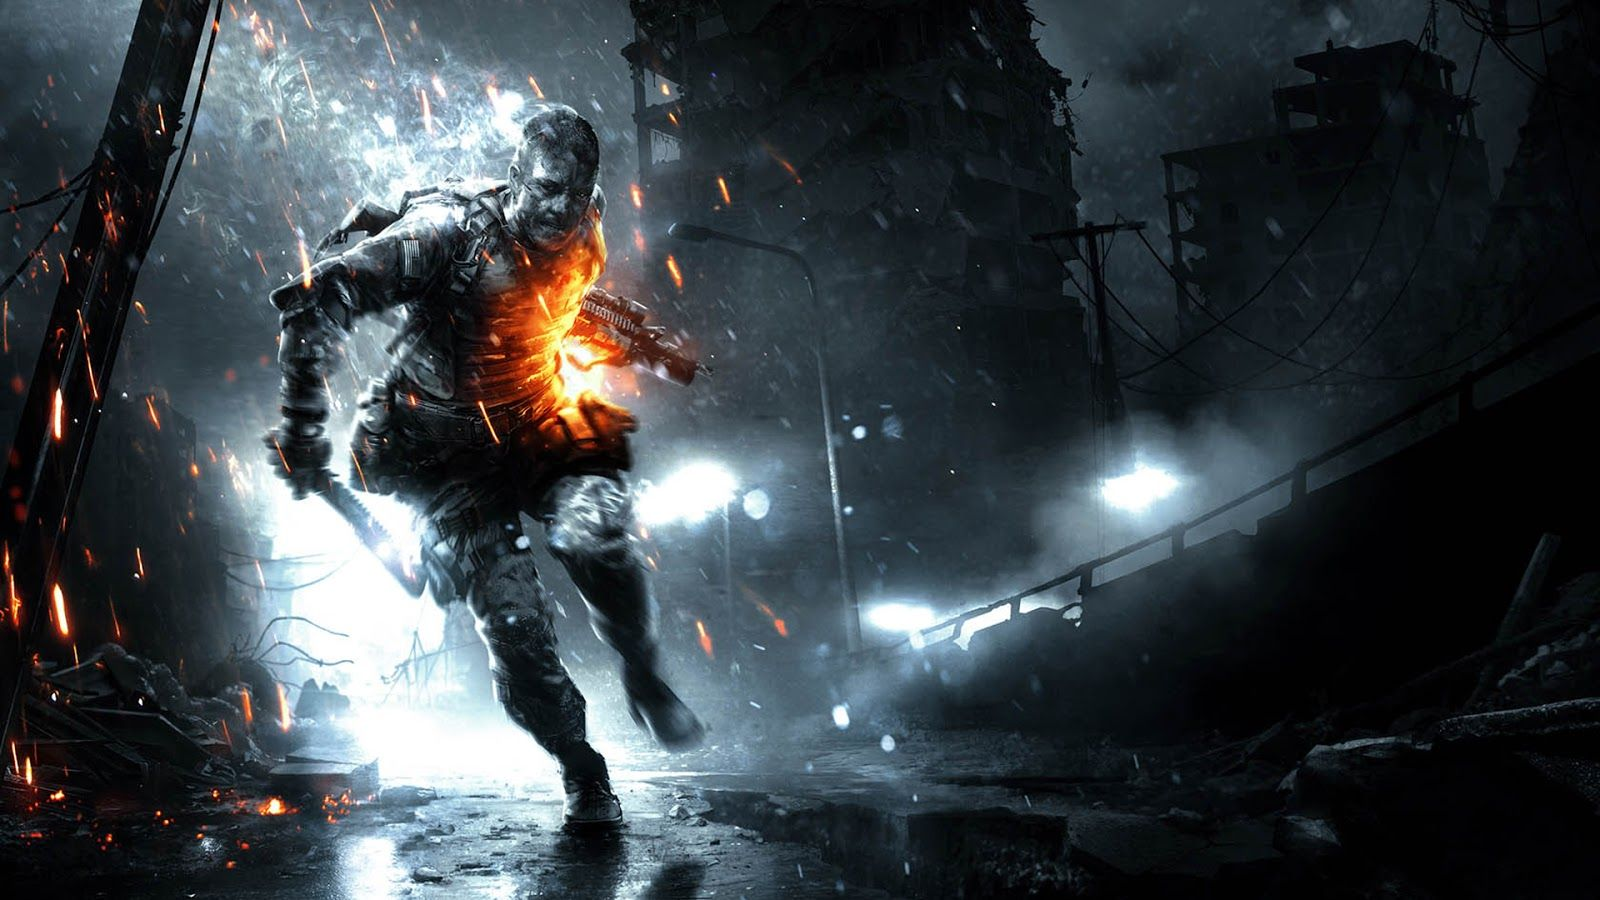 Hd wallpaper games - Battlefield Cover Poster Game Hd Wallpaper 2013 Game Hd Wallpaper